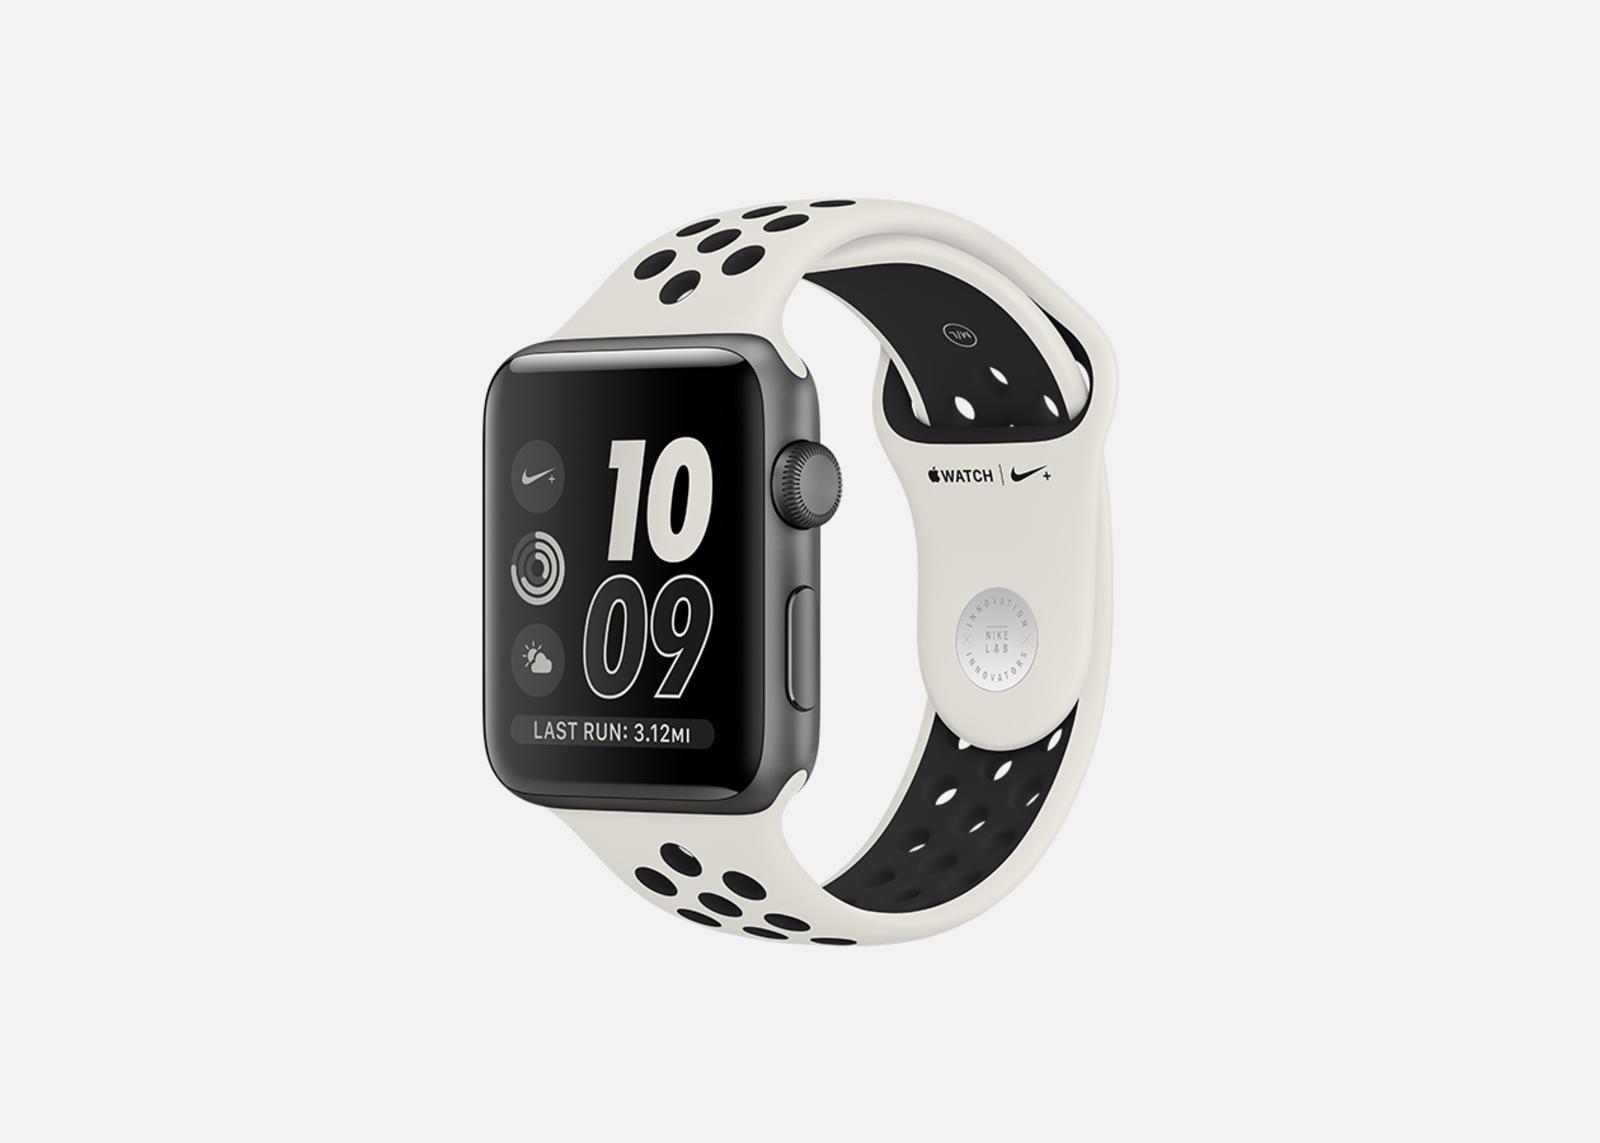 apple_watch_nikelab_1_rectangle_1600.jpg